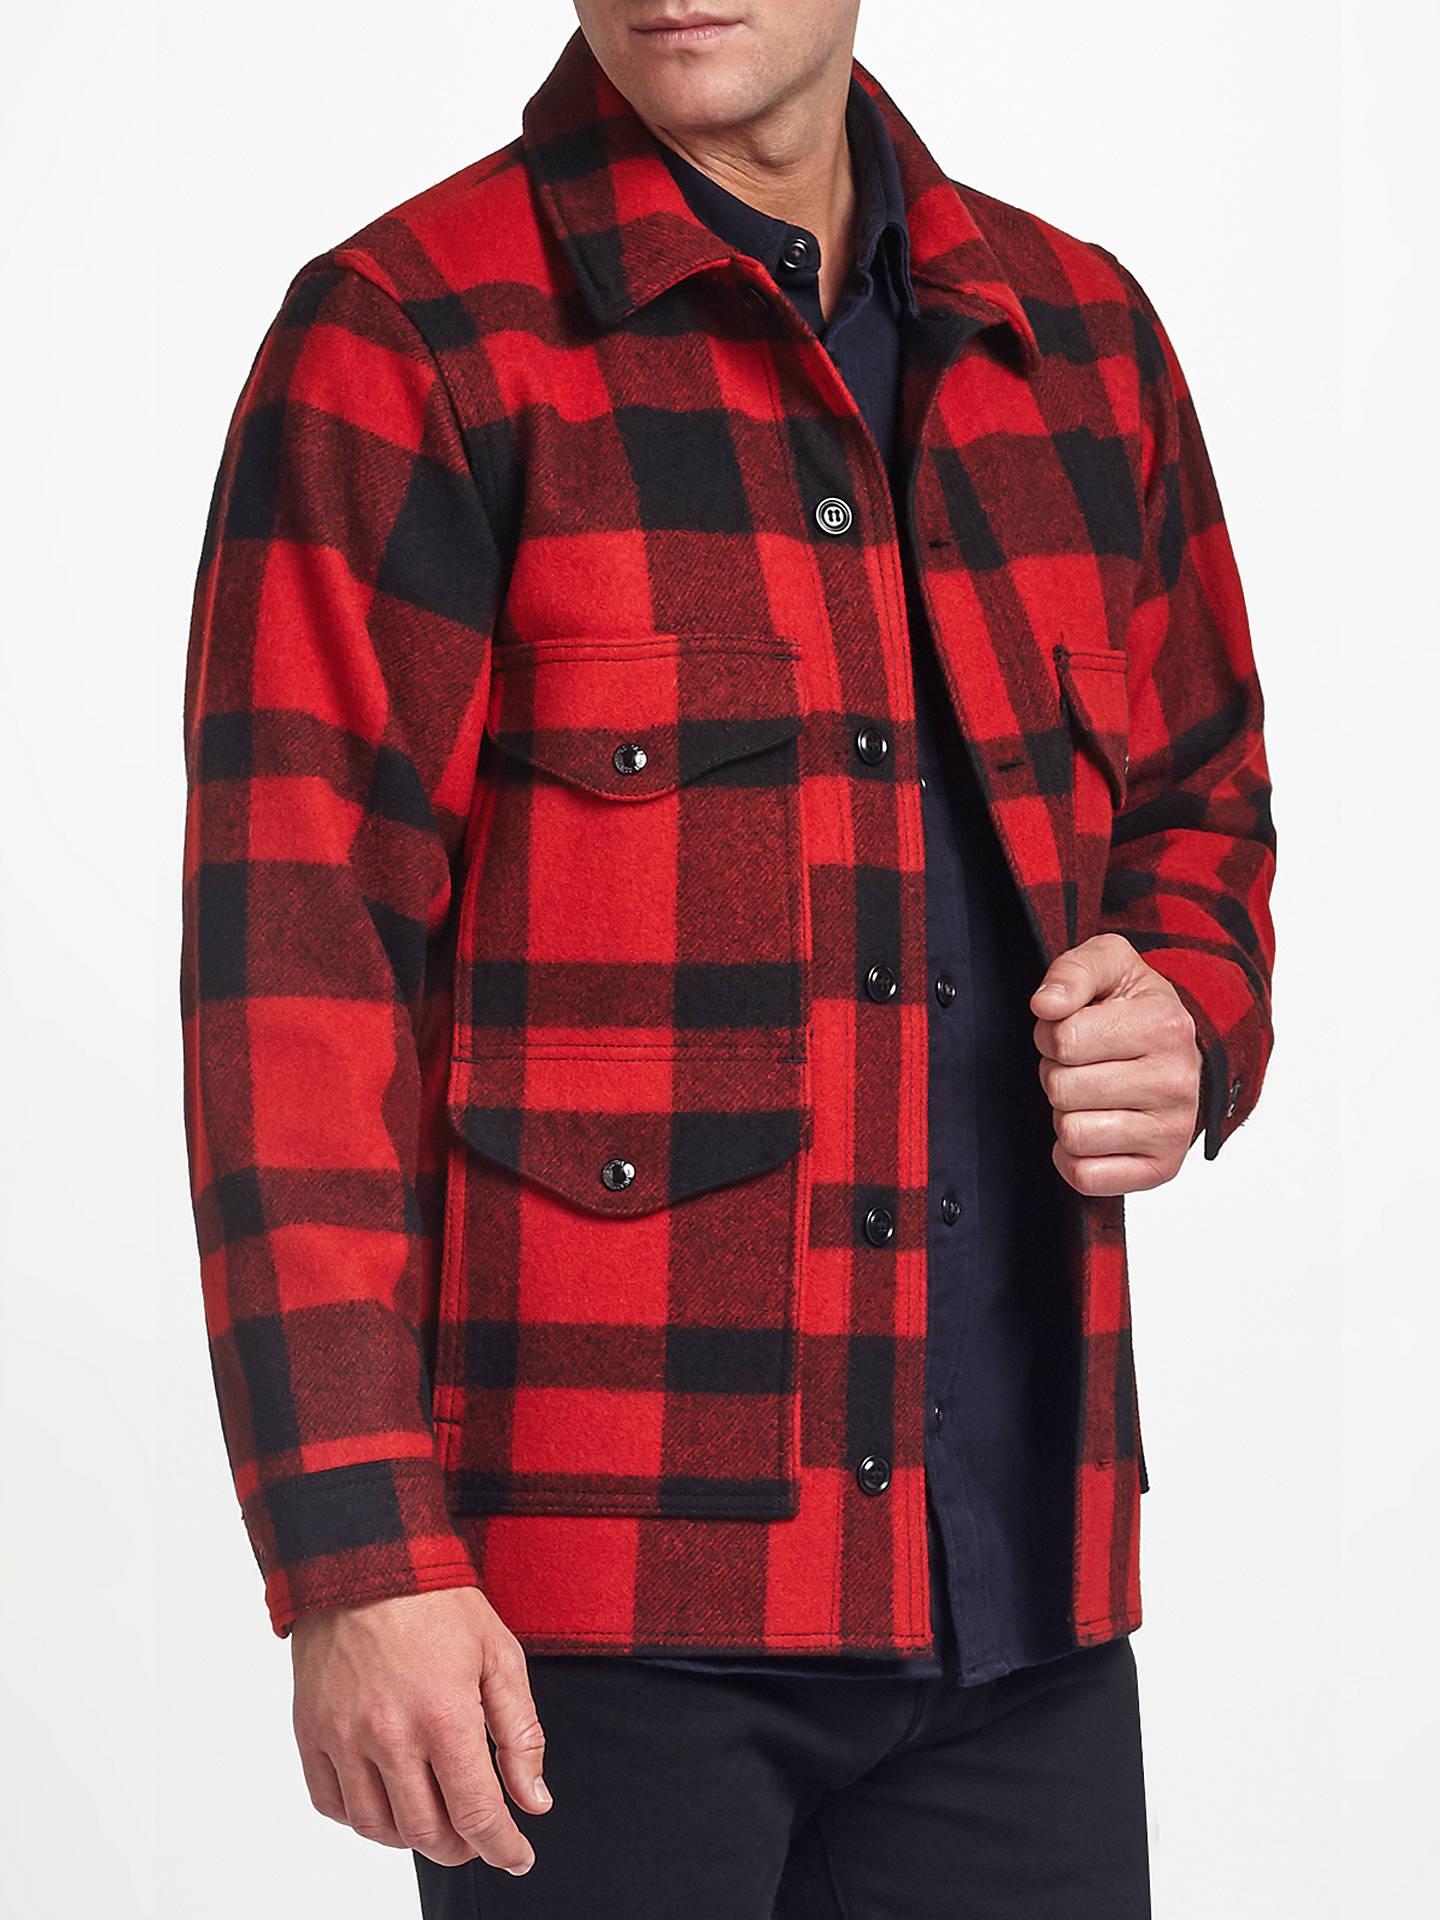 91b0b59425c BuyFilson Mackinaw Wool Cruiser Jacket